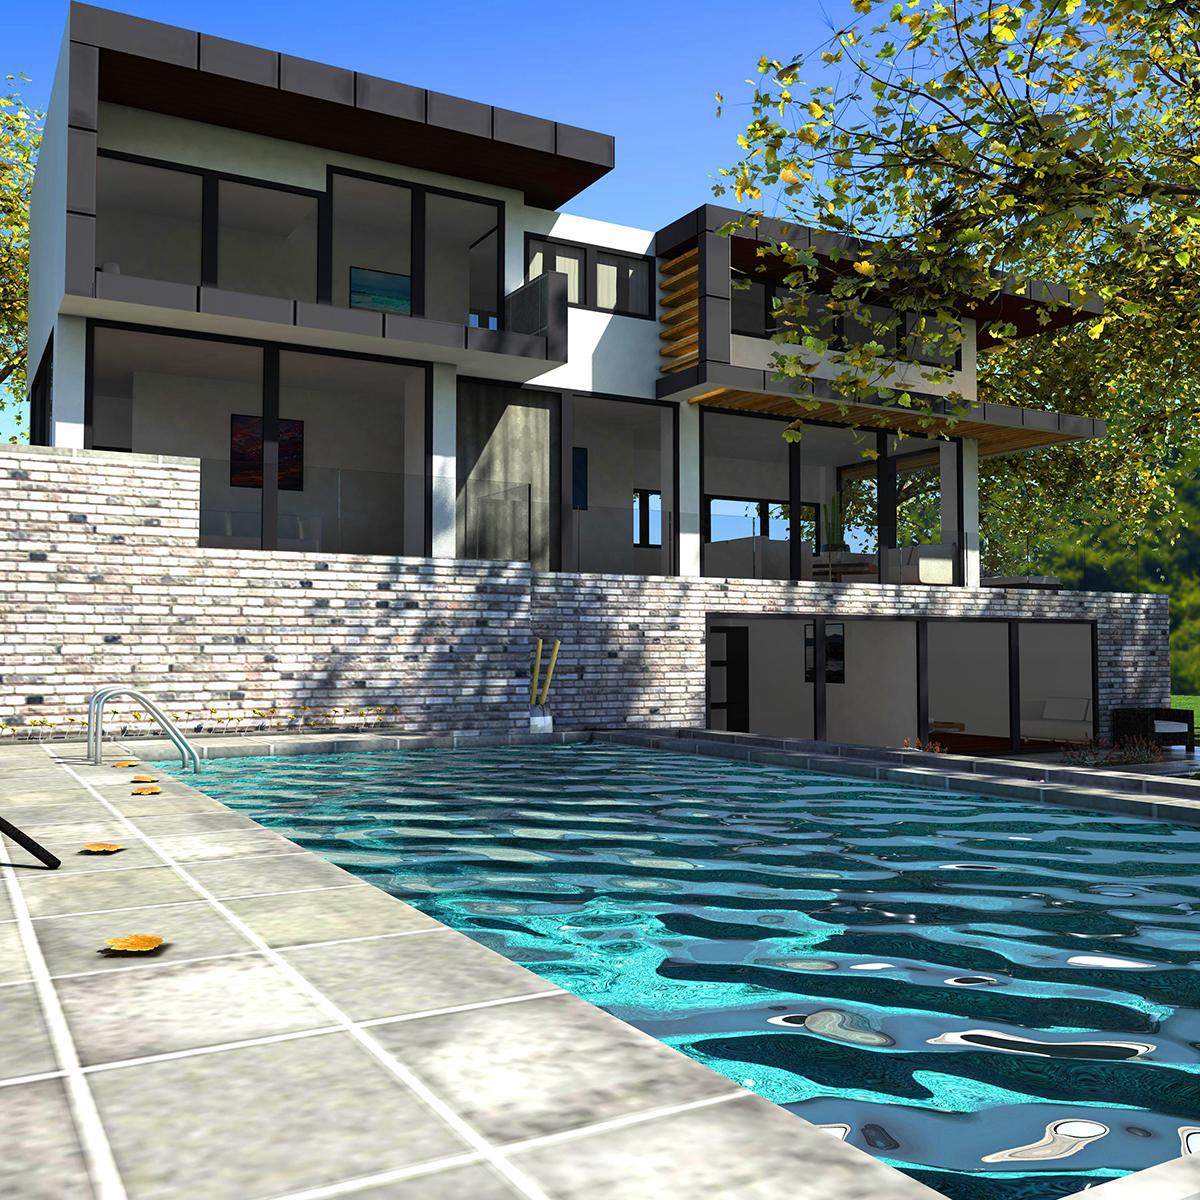 luxurious house 3d model fbx c4d ma mb other obj 164600